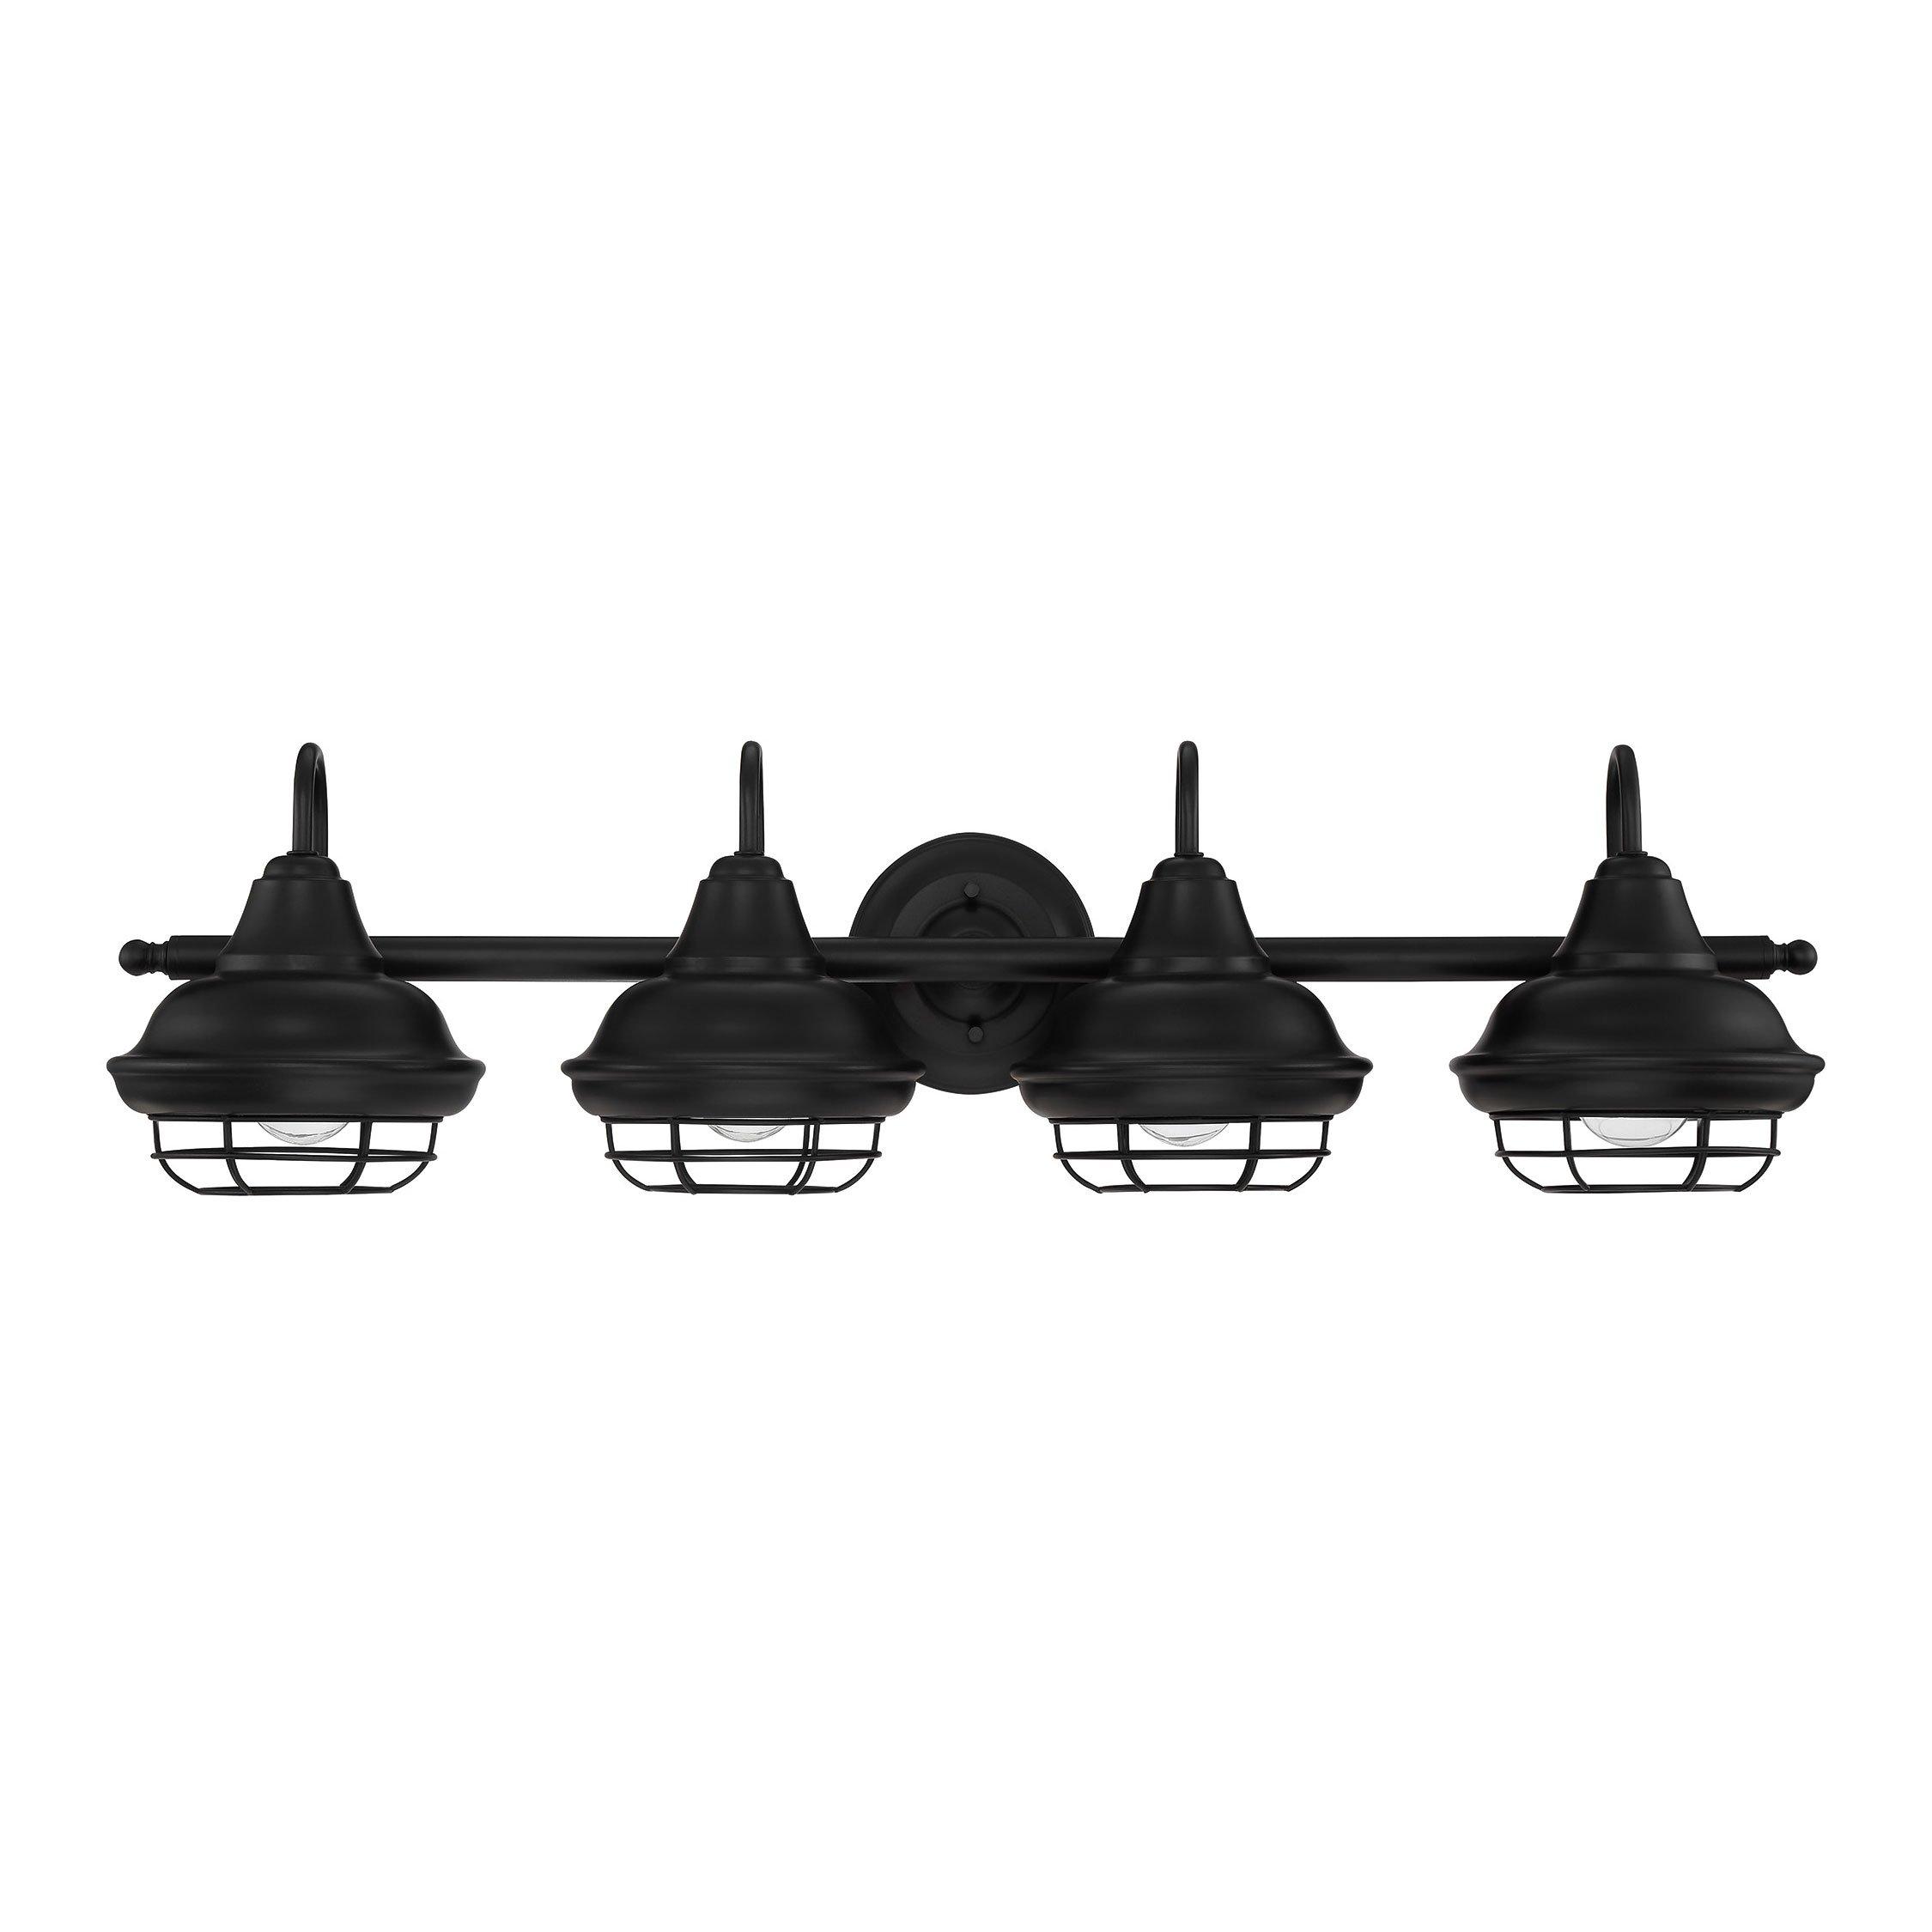 Designers Impressions Charleston Matte Black 4 Light Wall Sconce/Bathroom Fixture: 10014